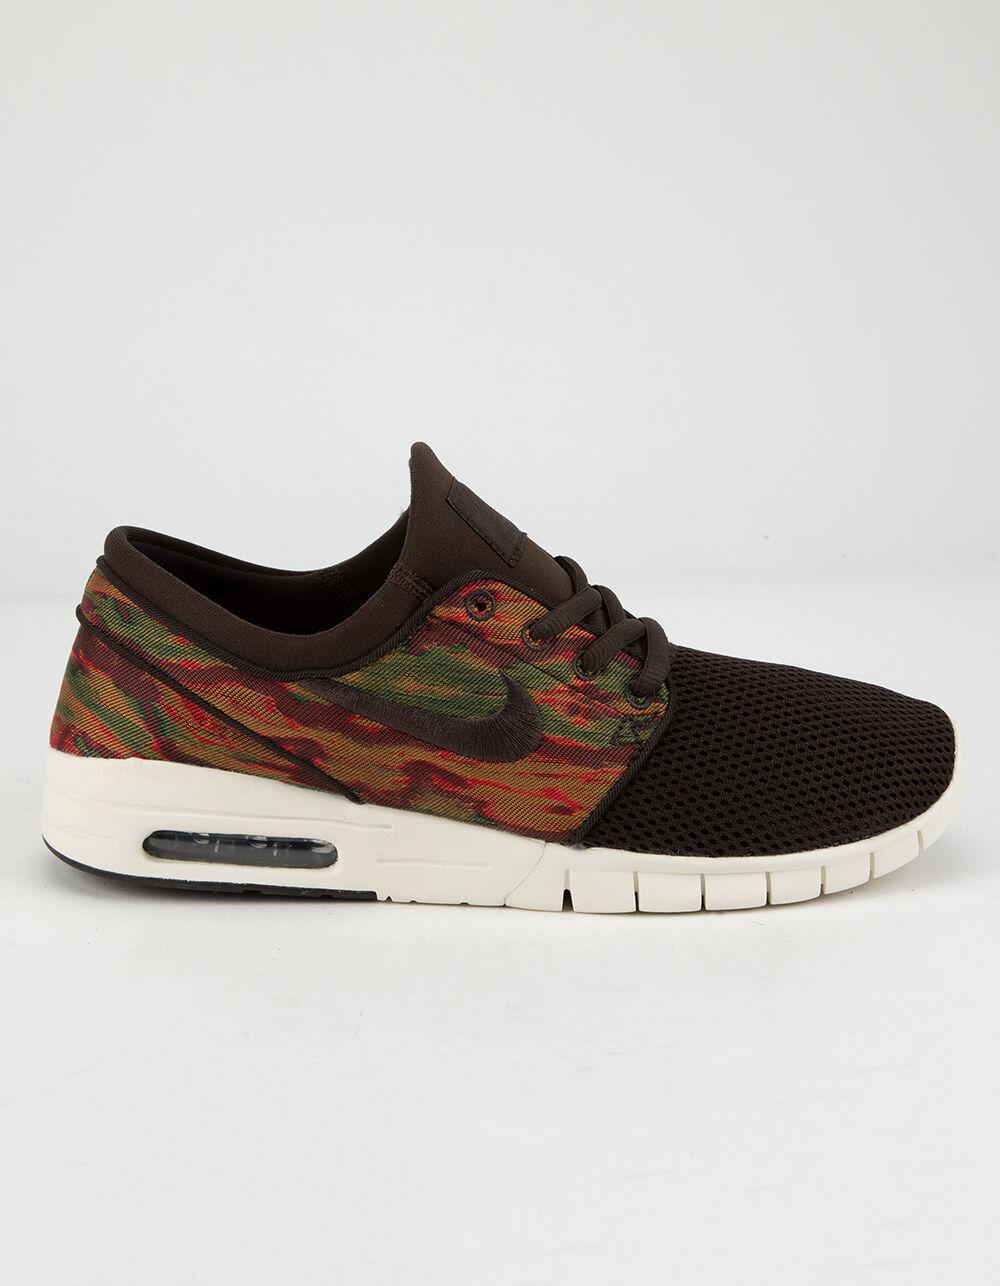 NIKE SB Stefan Janoski Max Velvet Brown Shoes